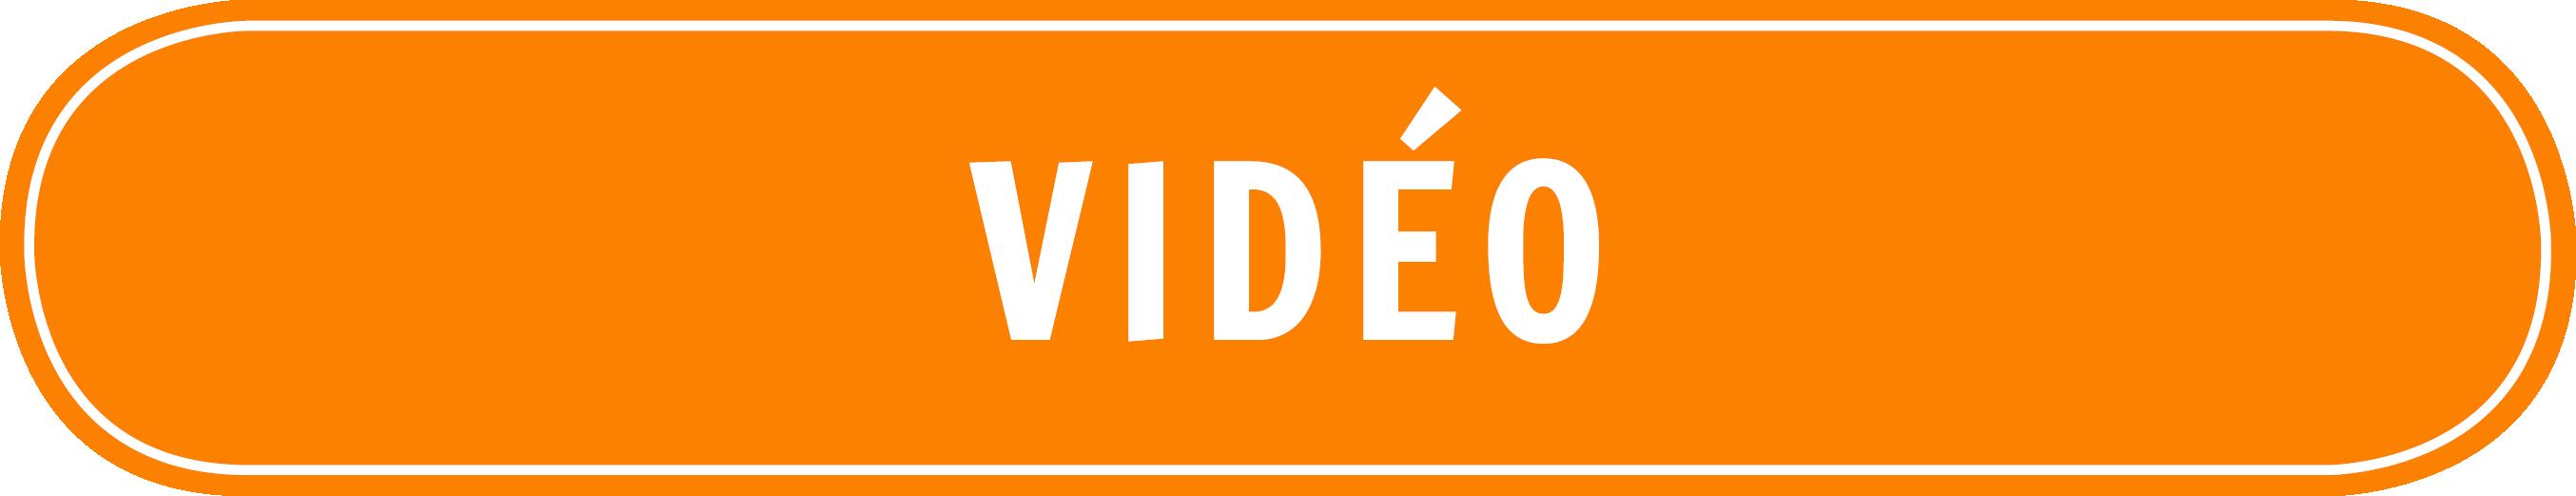 nimes-video-gard